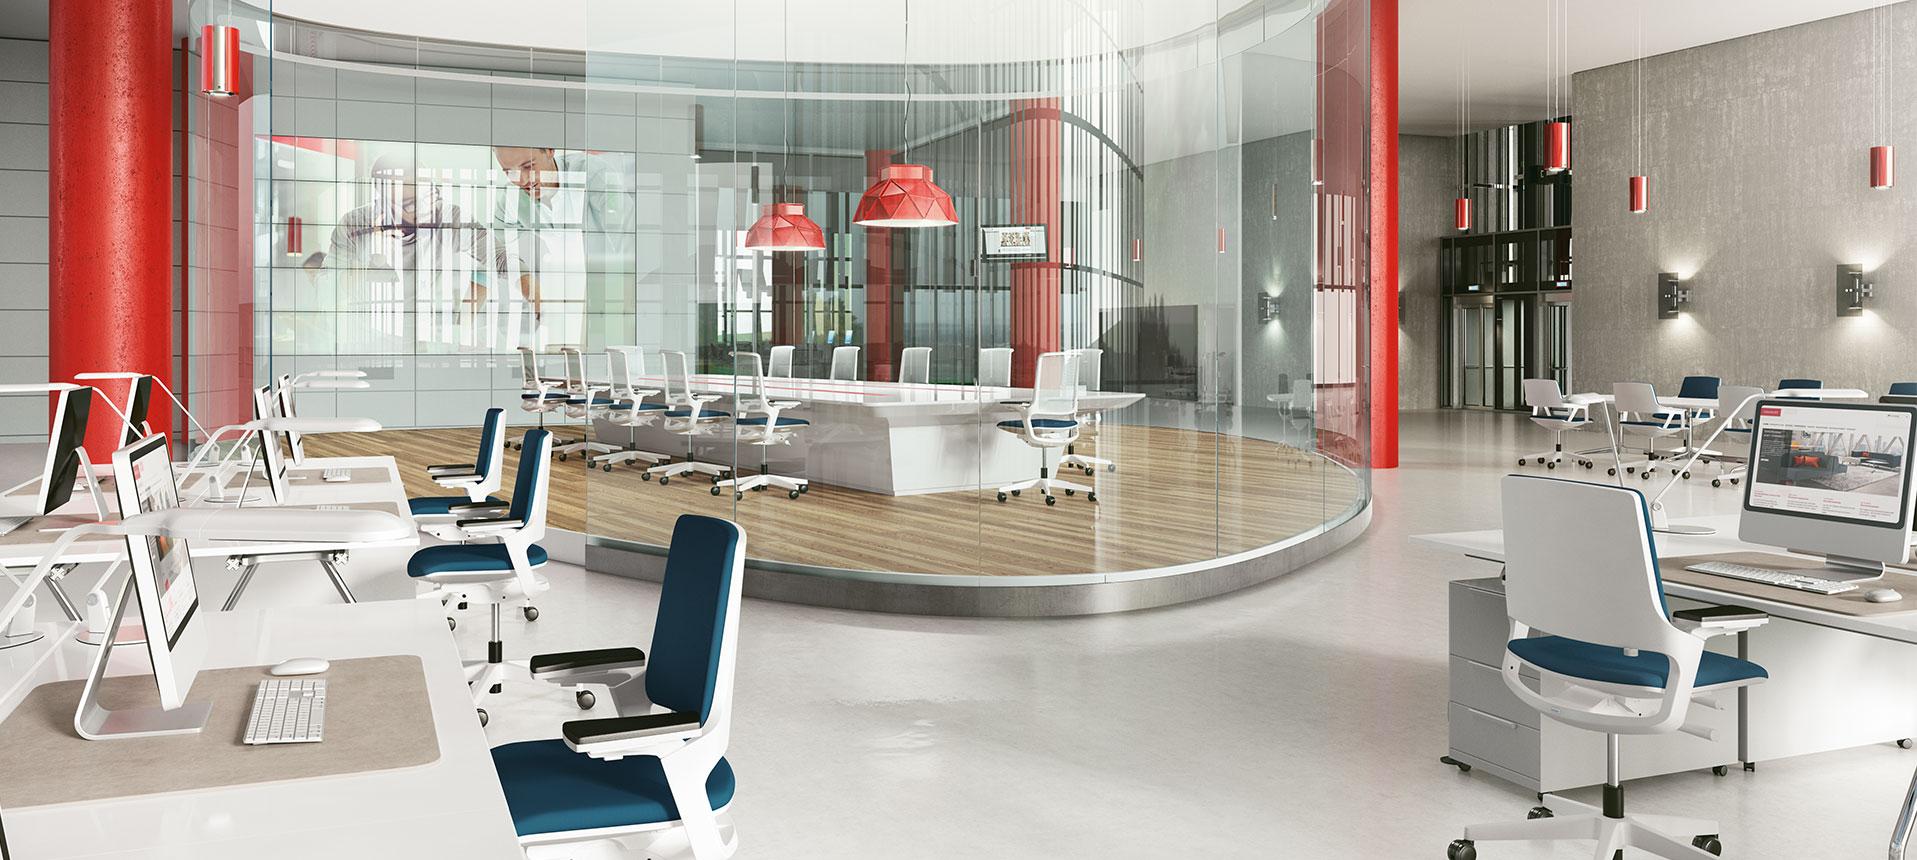 Moderne bürokonzepte  Das Großraumbüro neu gedacht